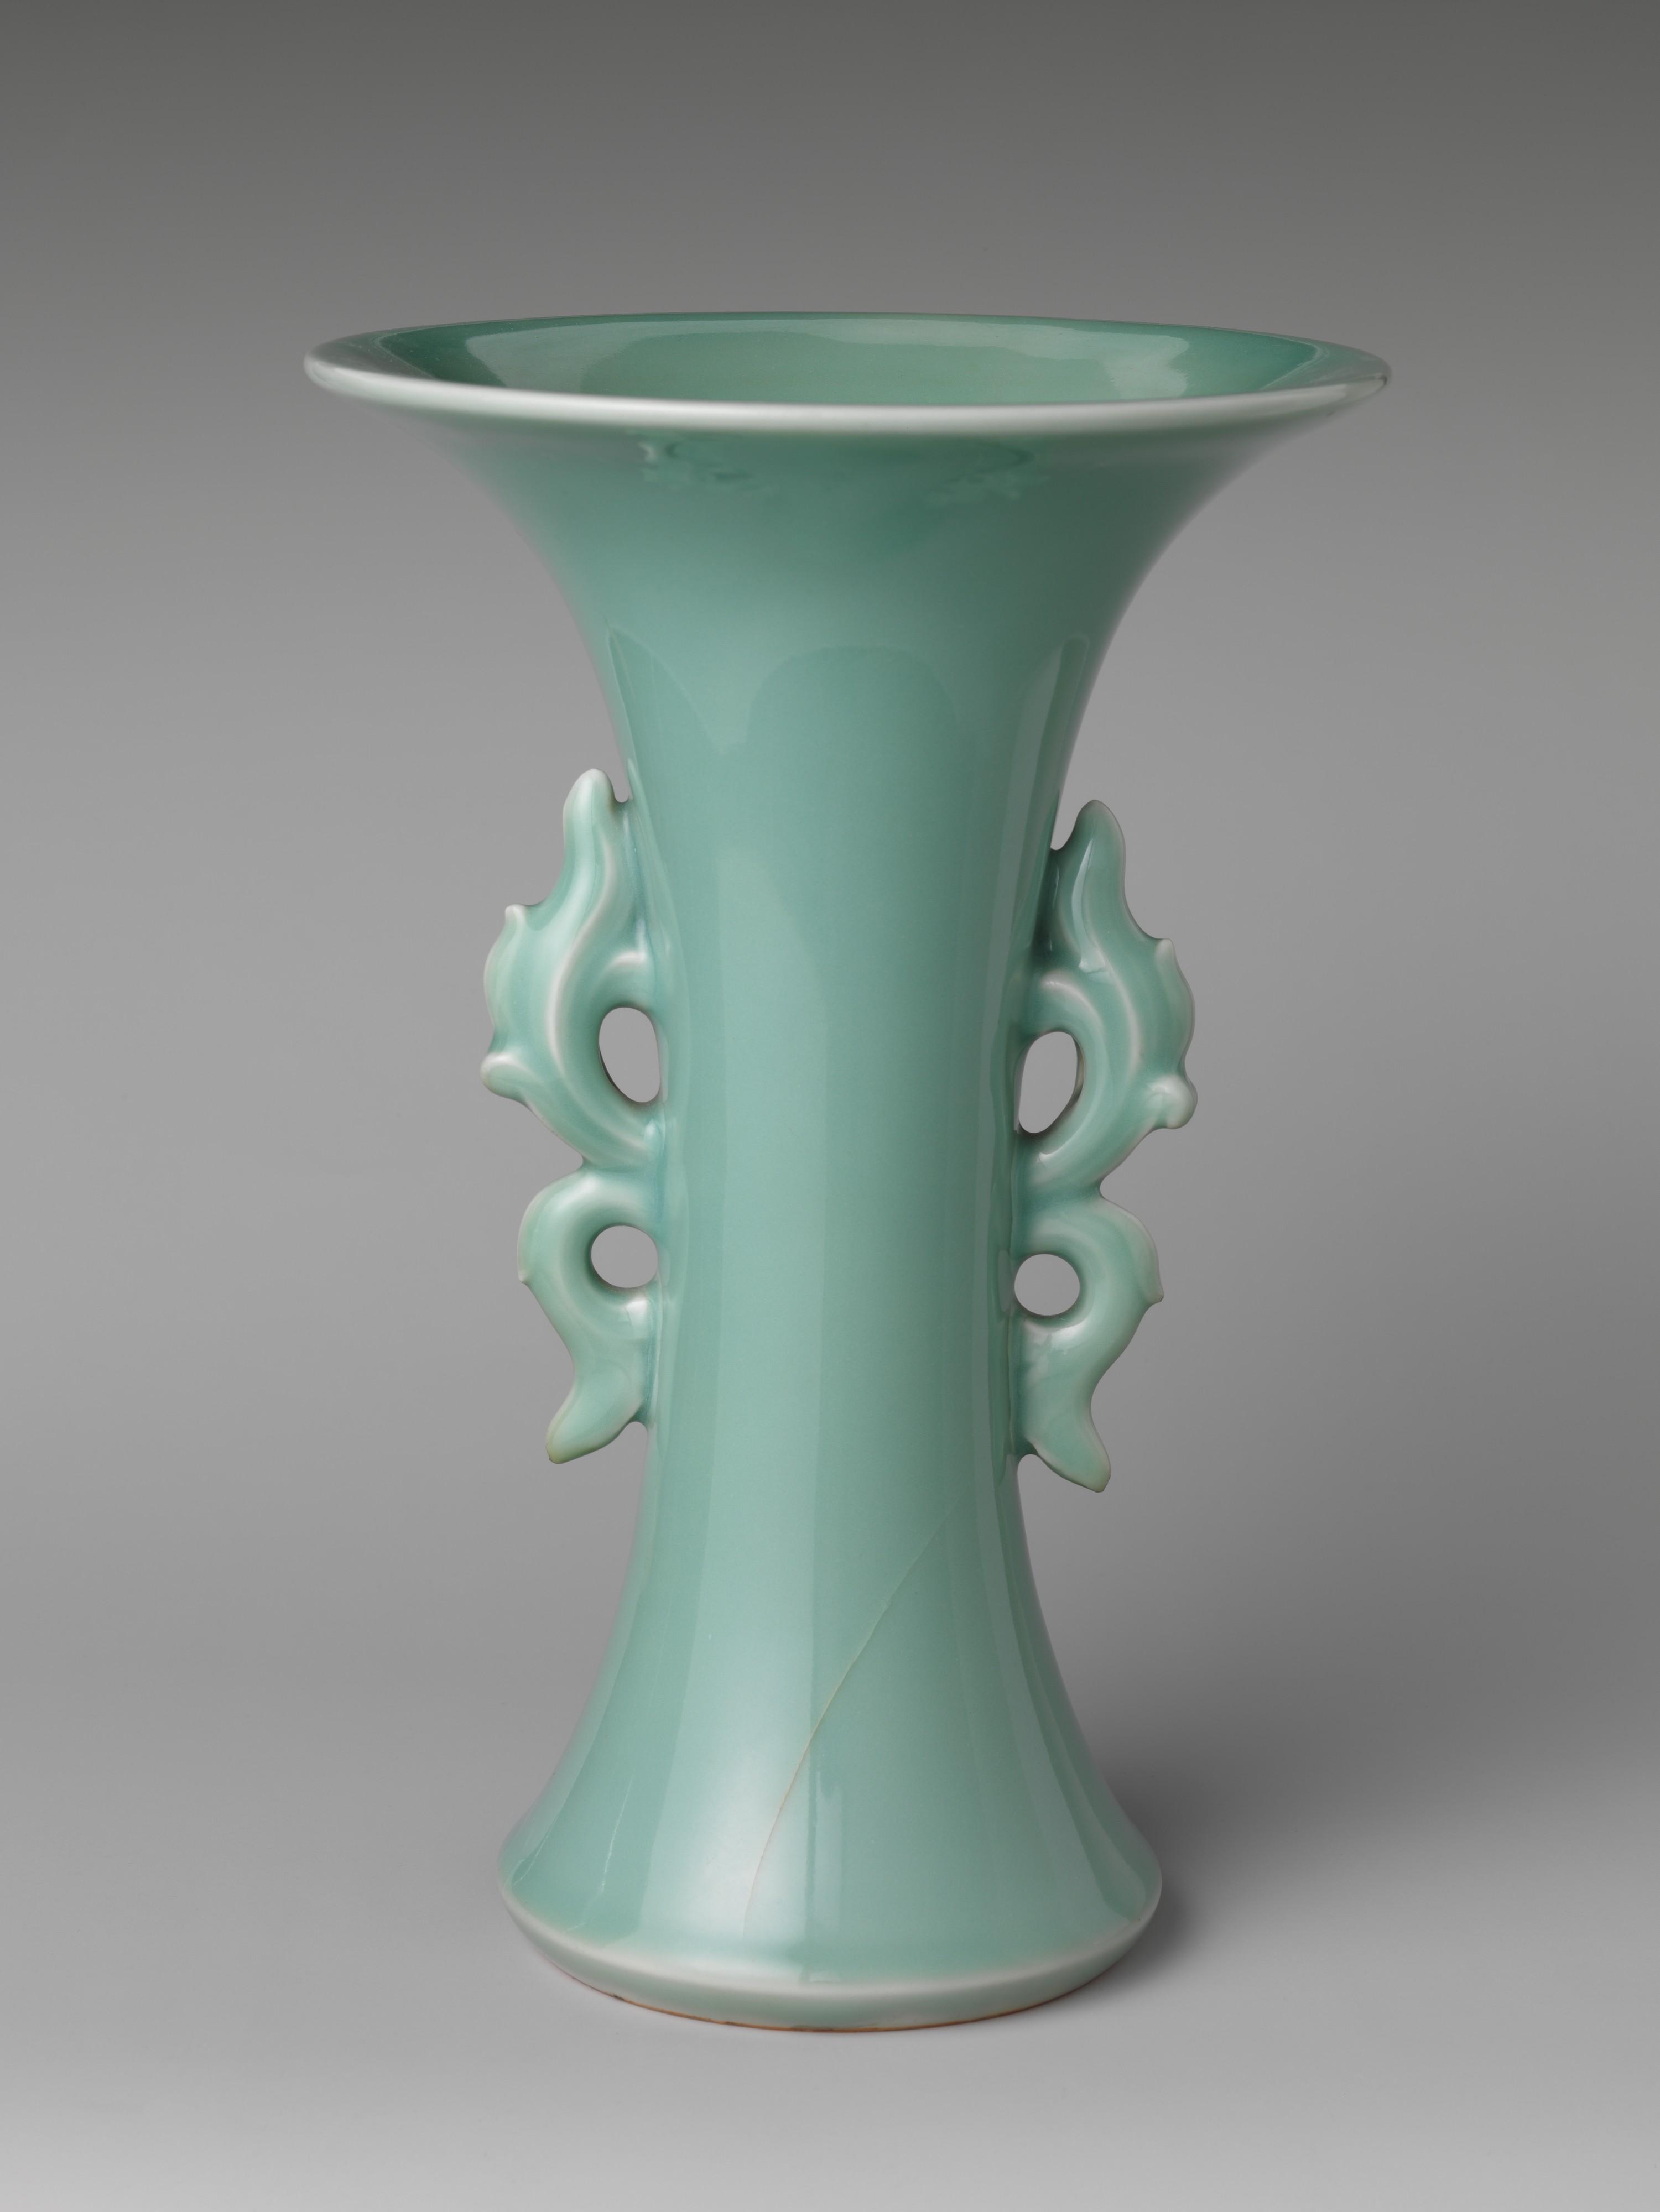 50 elegant vase shapes home idea vase in shape of archaic chinese bronze japan reviewsmspy